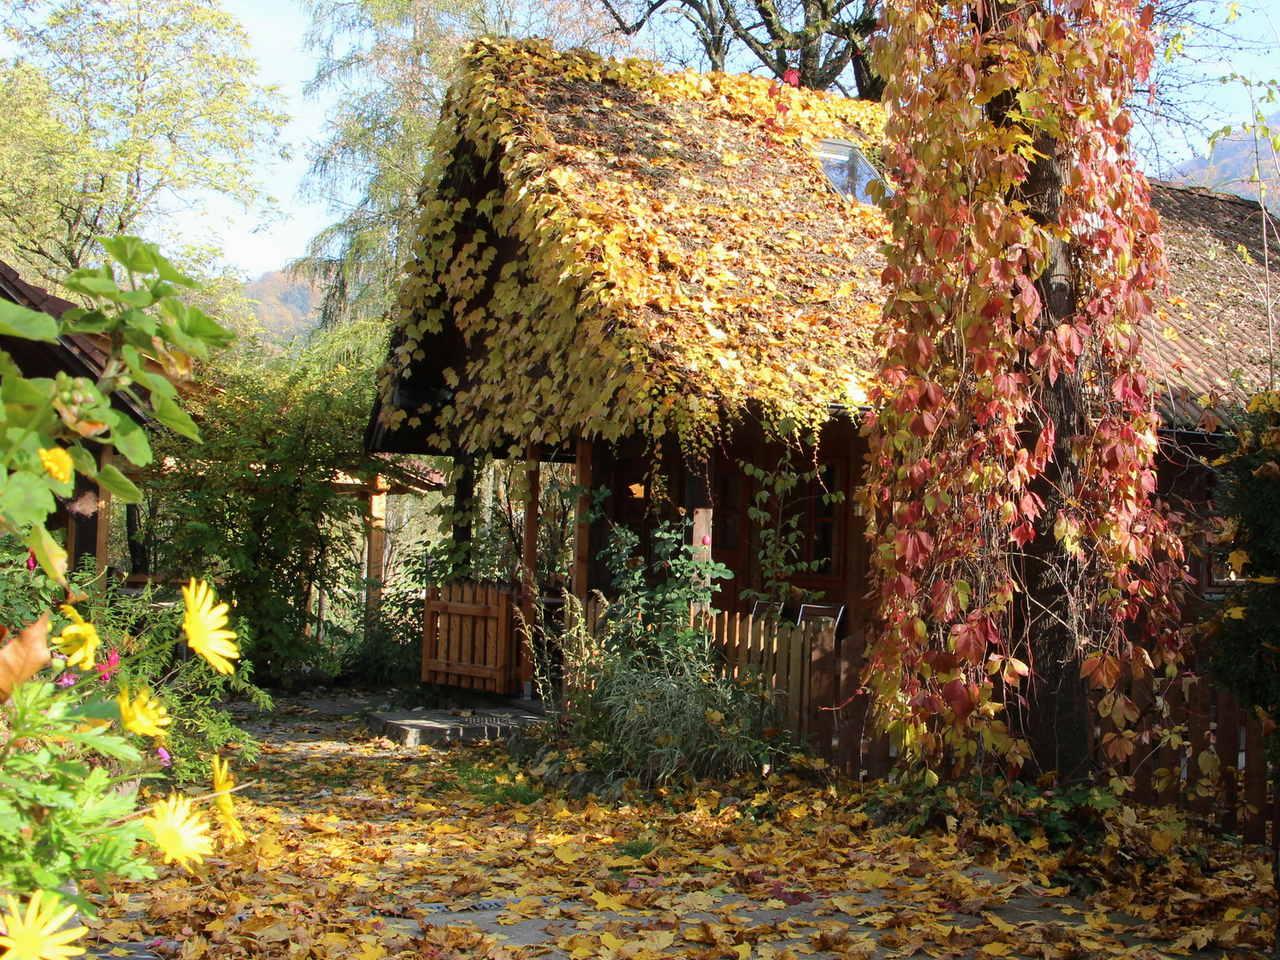 Gartenhaus im Herbst Naturidyll Hotel Steinschalerhof